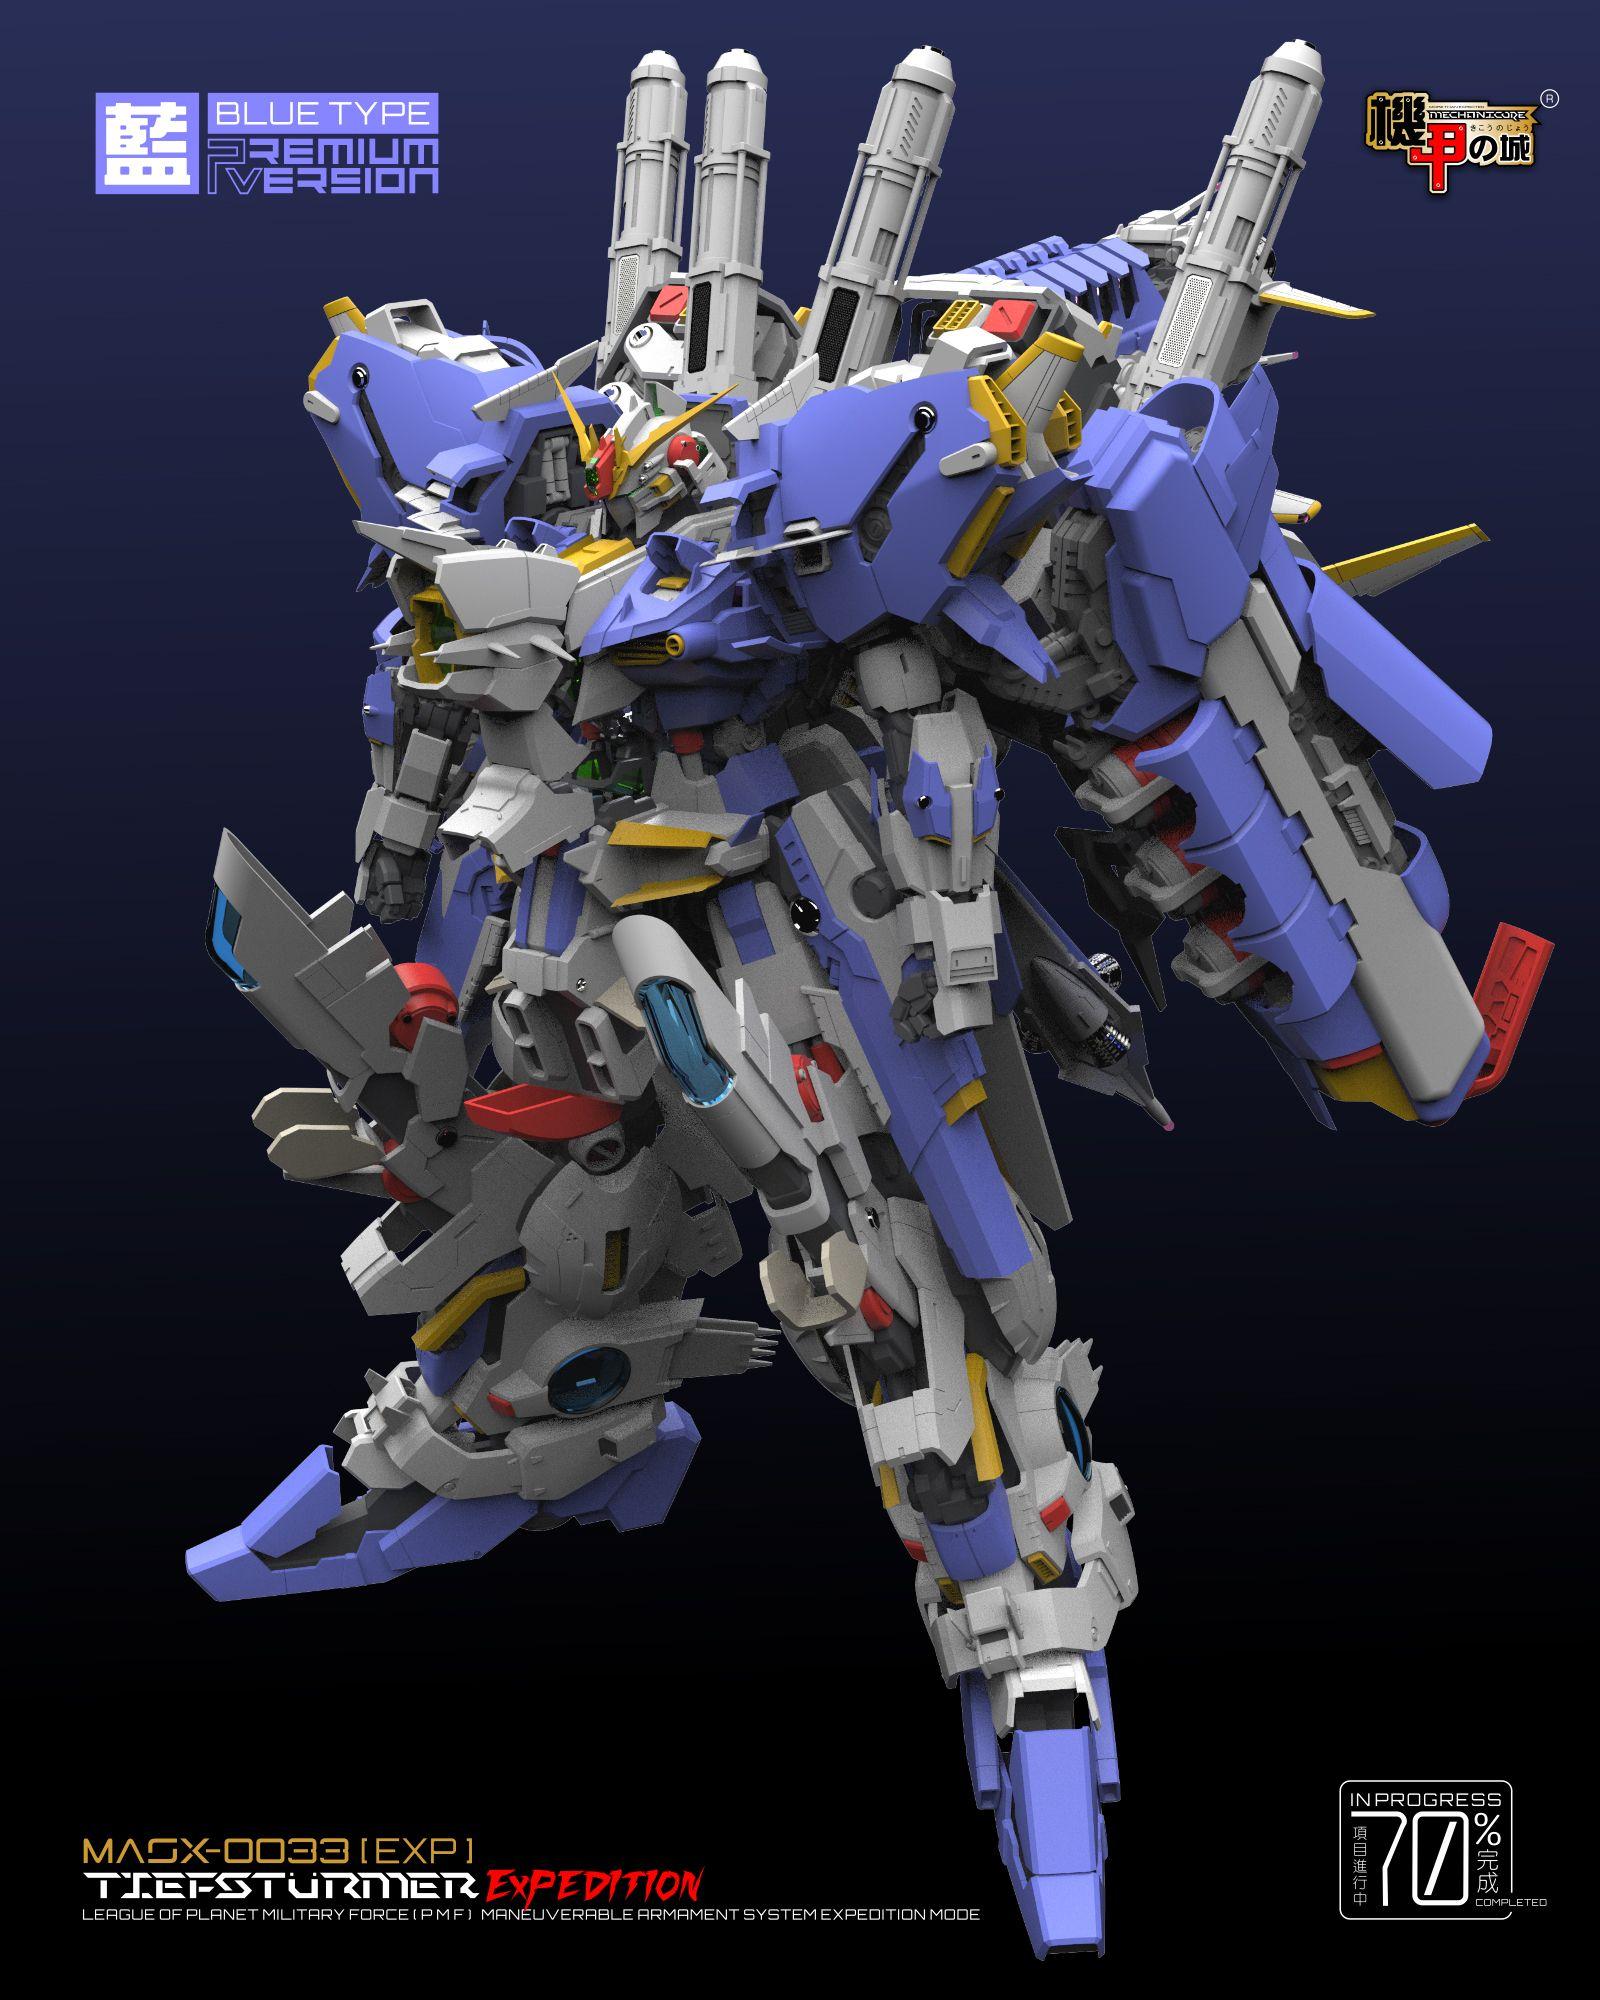 1 72 Mas 0033 Msa 0011 Ext Ex Sガンダム プラモデル Mechani Core 機甲の城 Inask Info ゞ S ガンダム ガンダム プラモデル ガンダム